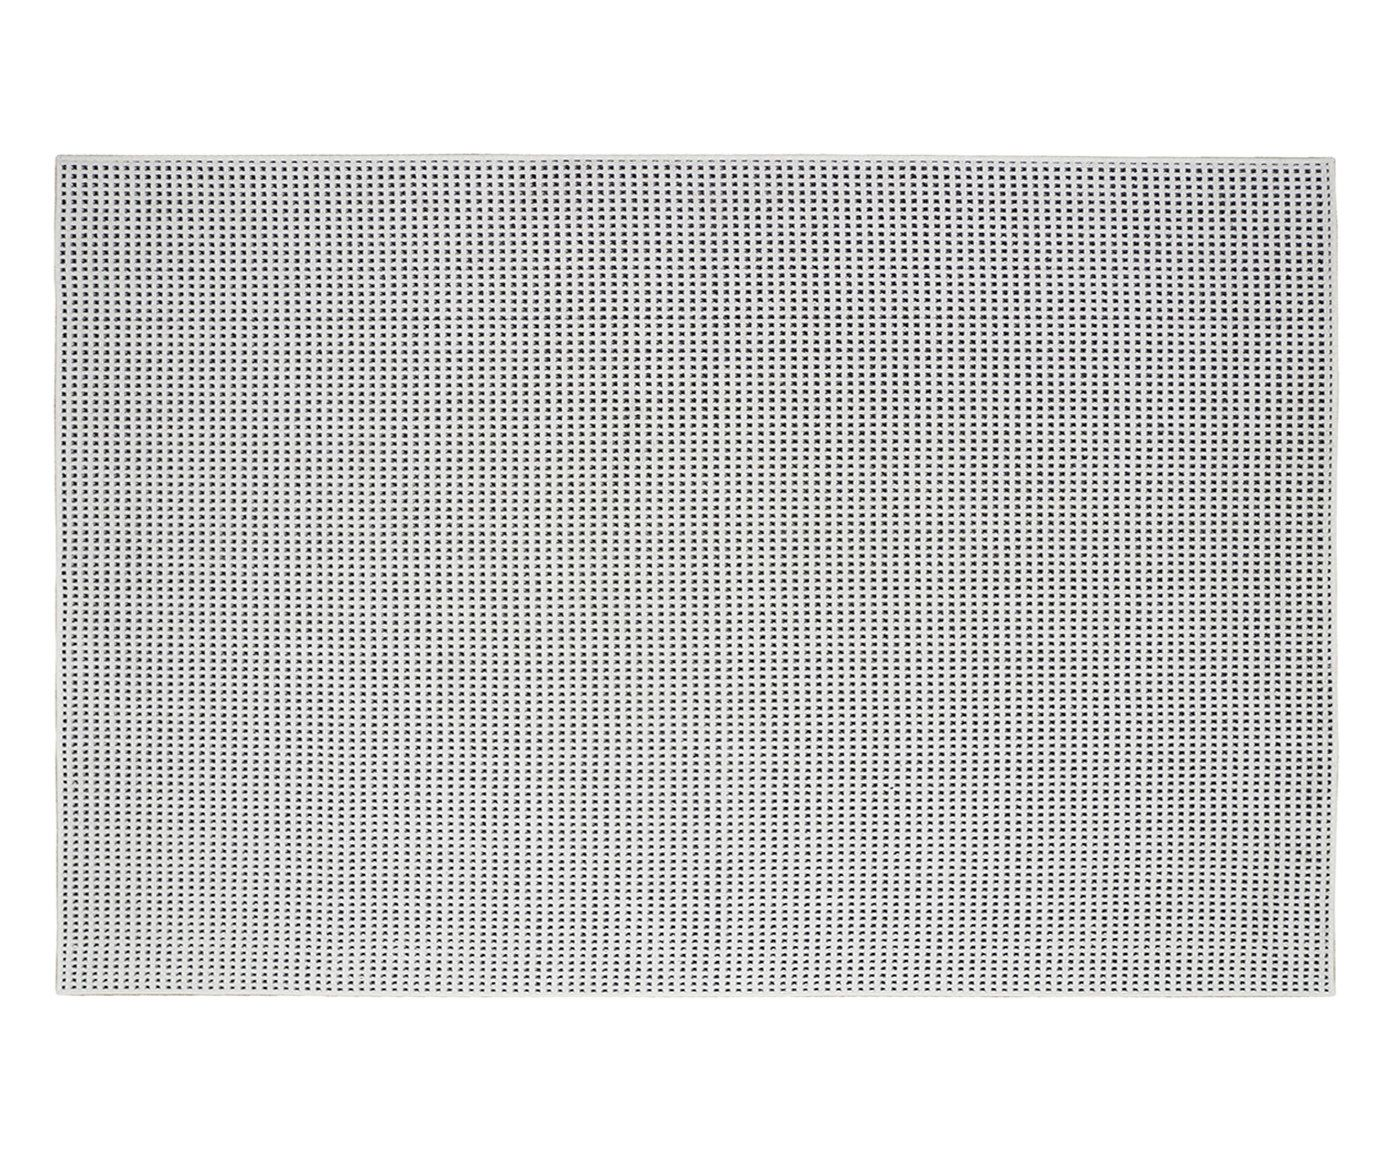 Tapete Cotton Natural - 240X340cm | Westwing.com.br